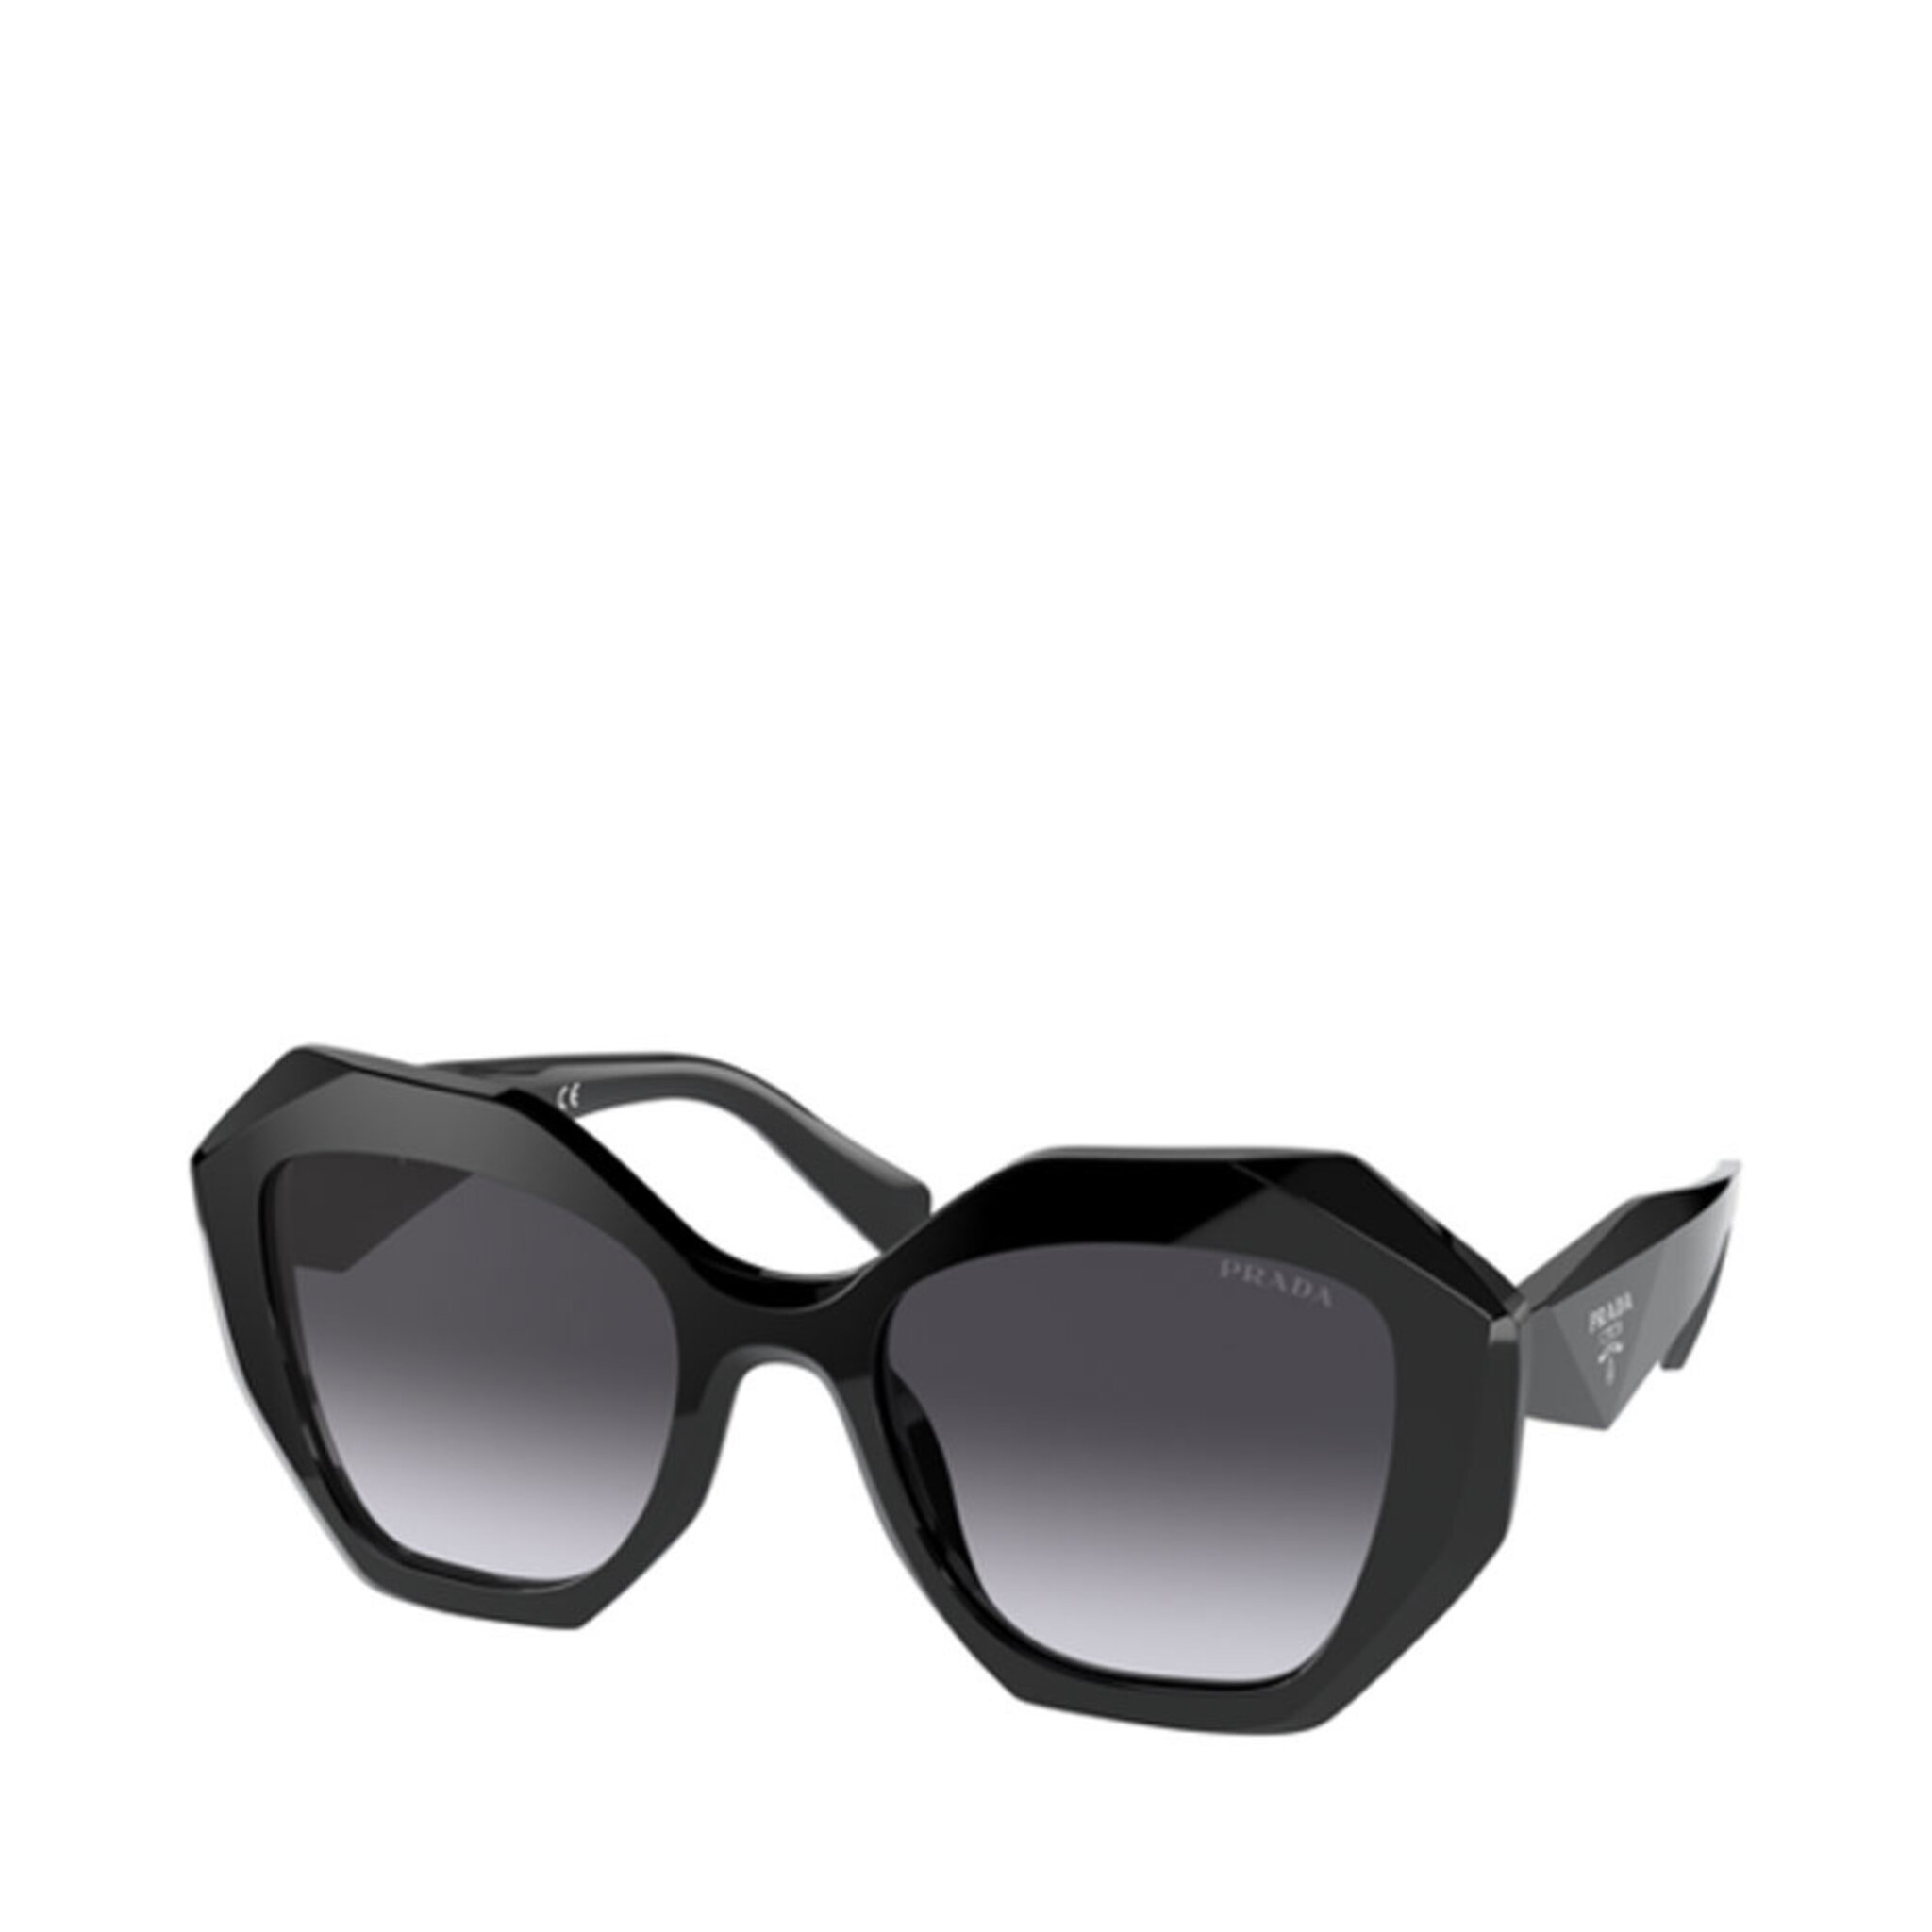 Sunglasses 0PR 16WS, 53